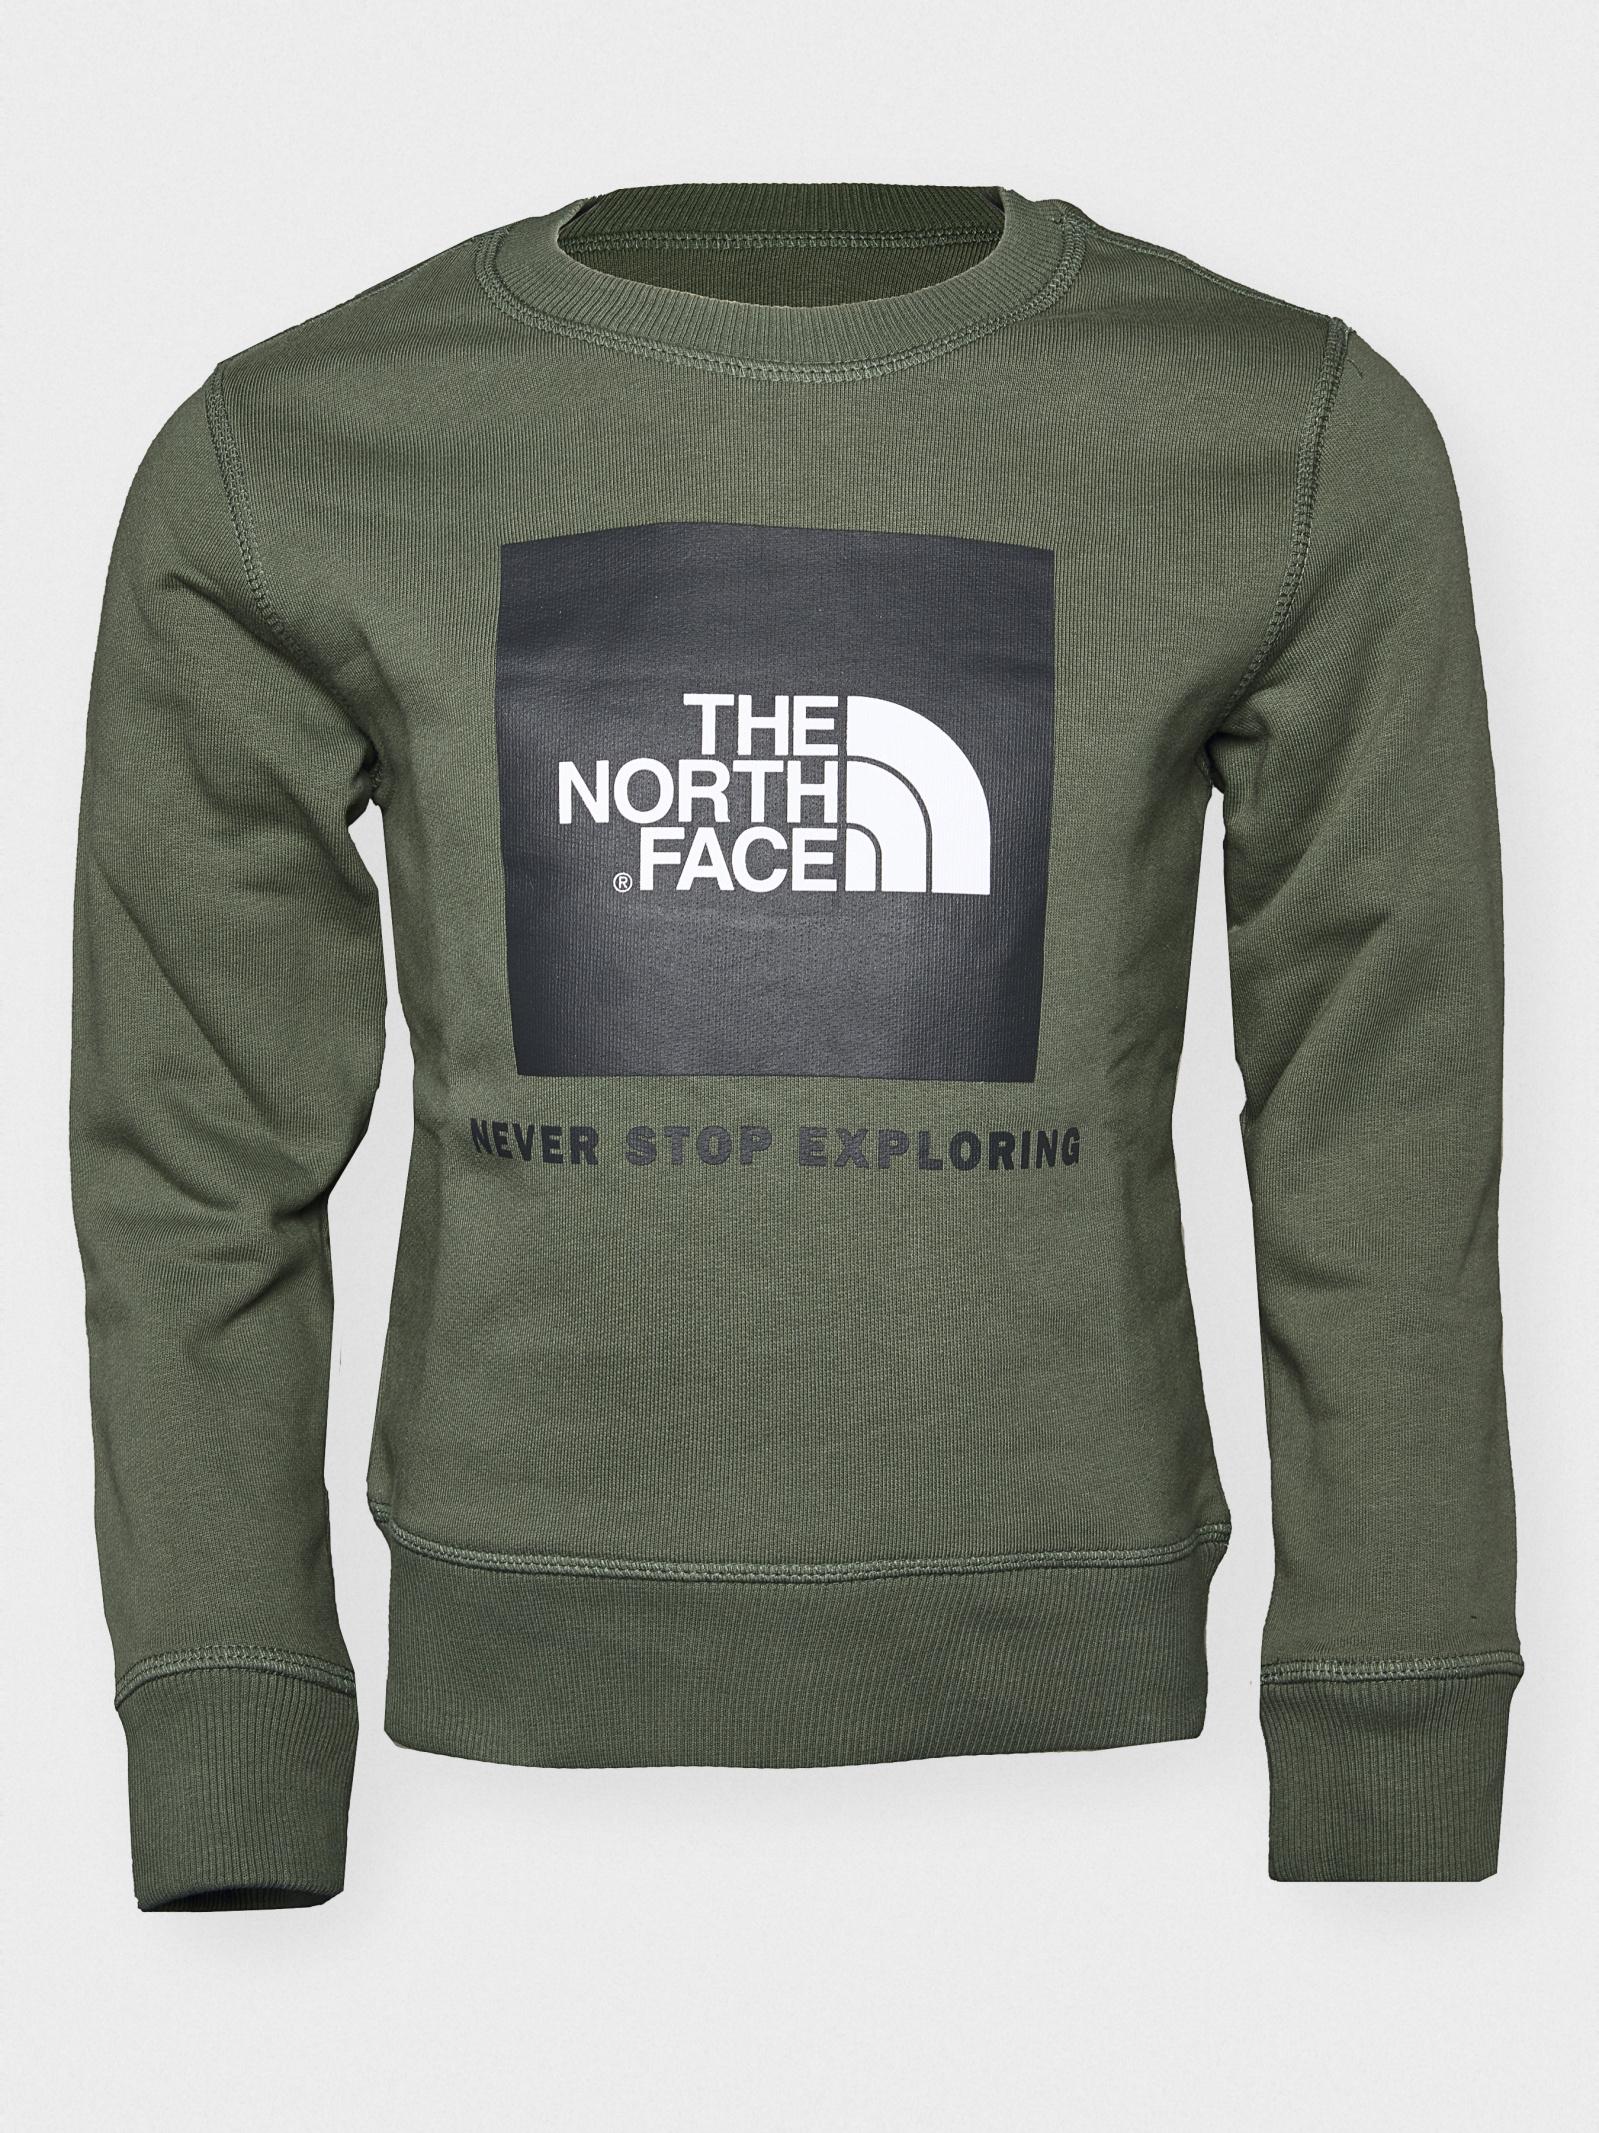 The North Face Кофти та светри дитячі модель NF0A37FYNYC1 , 2017